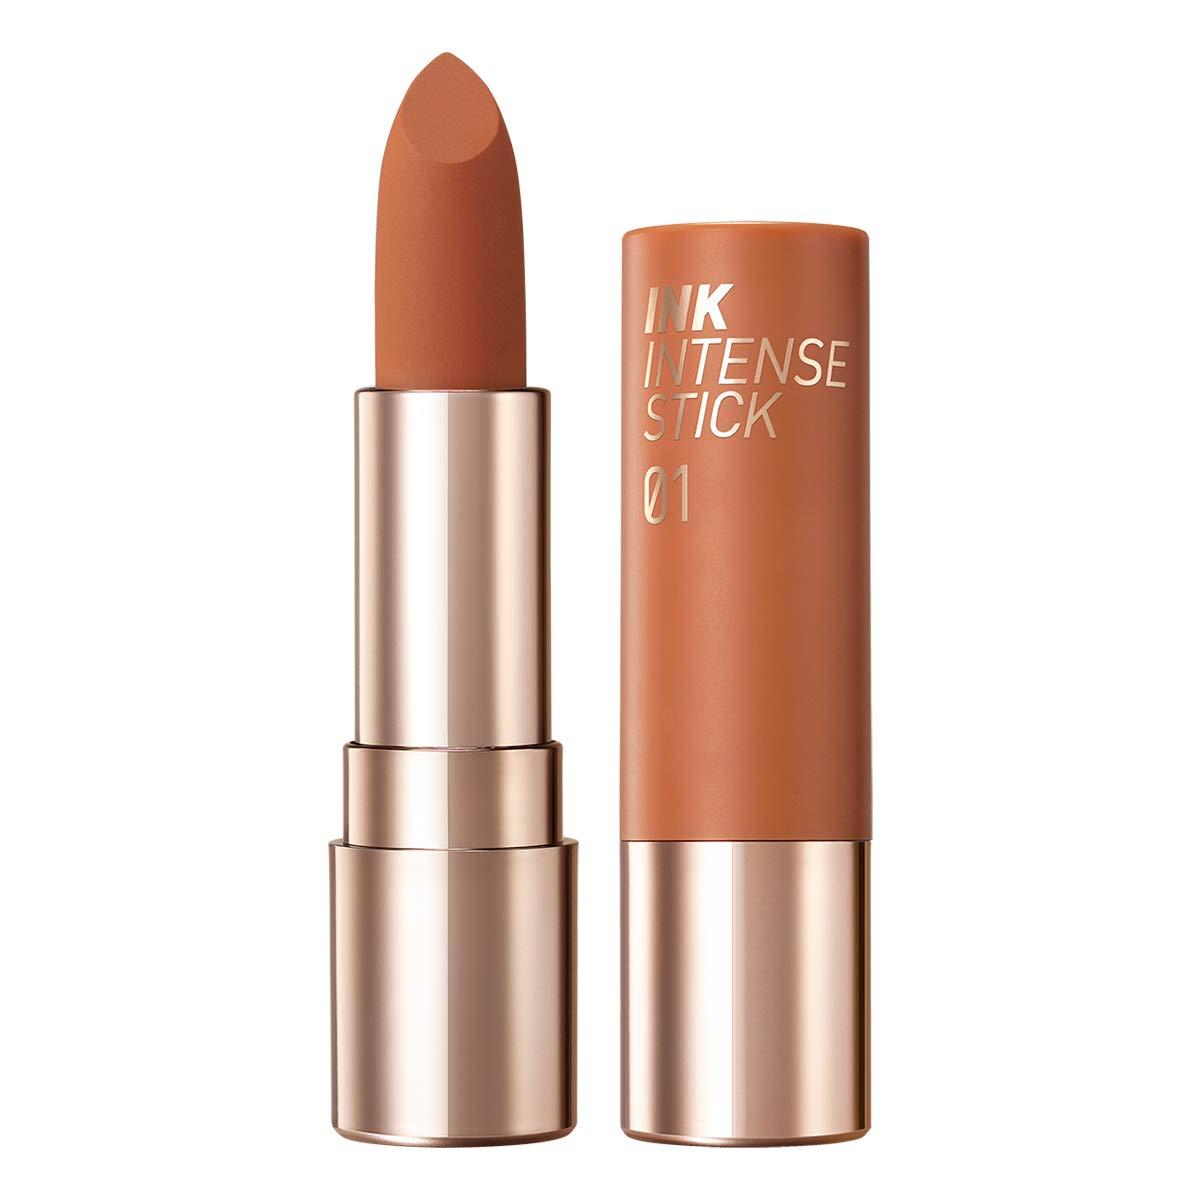 Peripera Ink the Velvet (Lipstick, 001 Soft Beige)